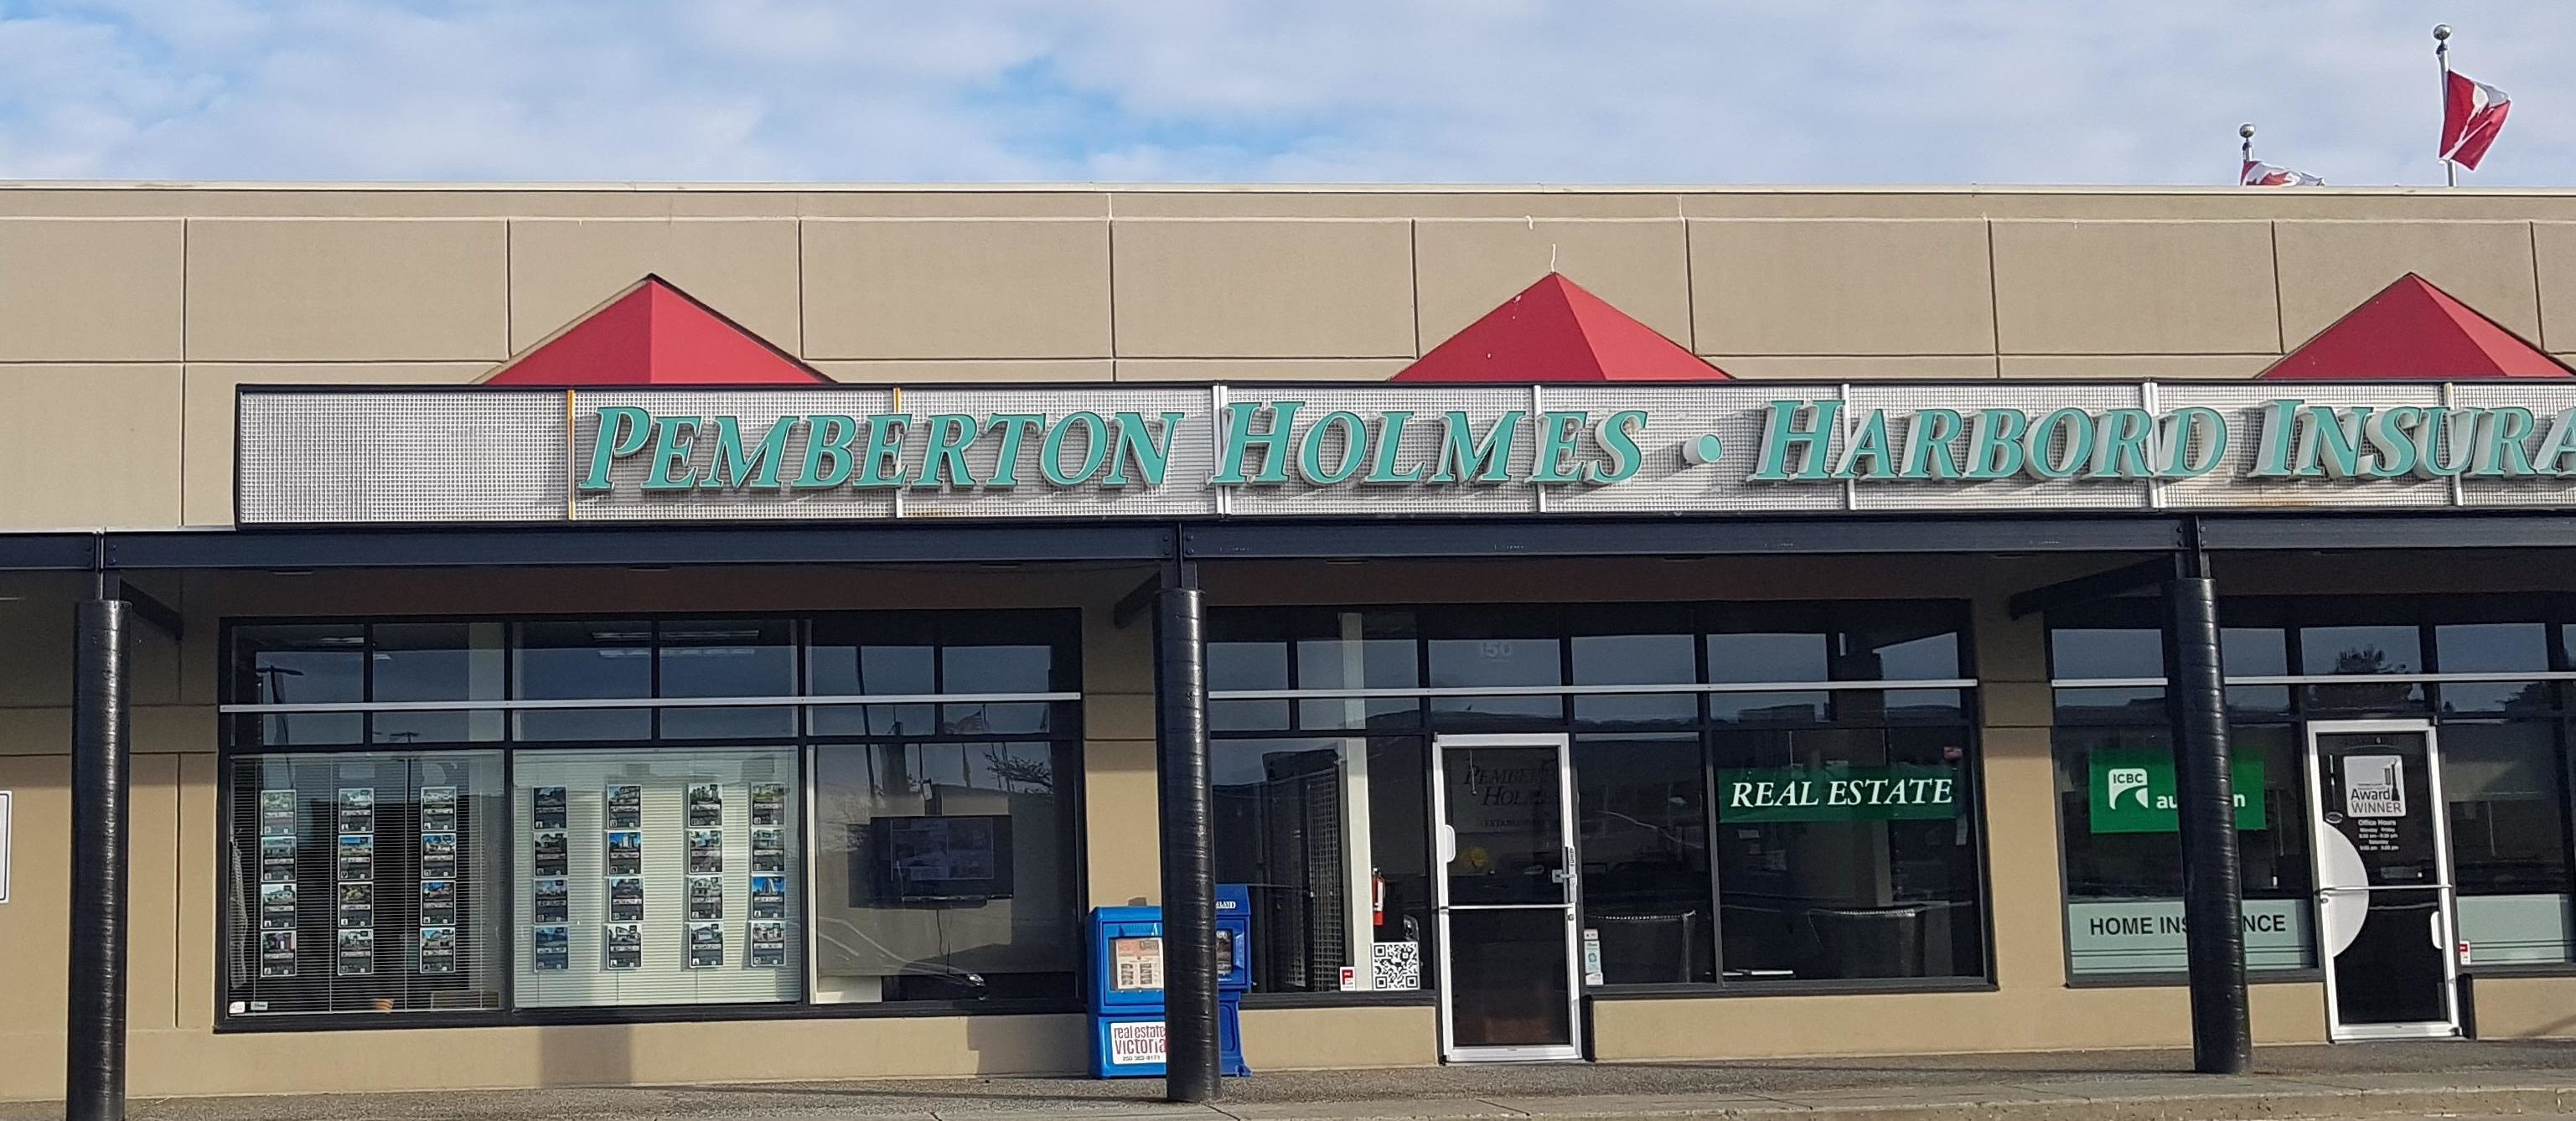 Pemberton Holmes Head Office contact information